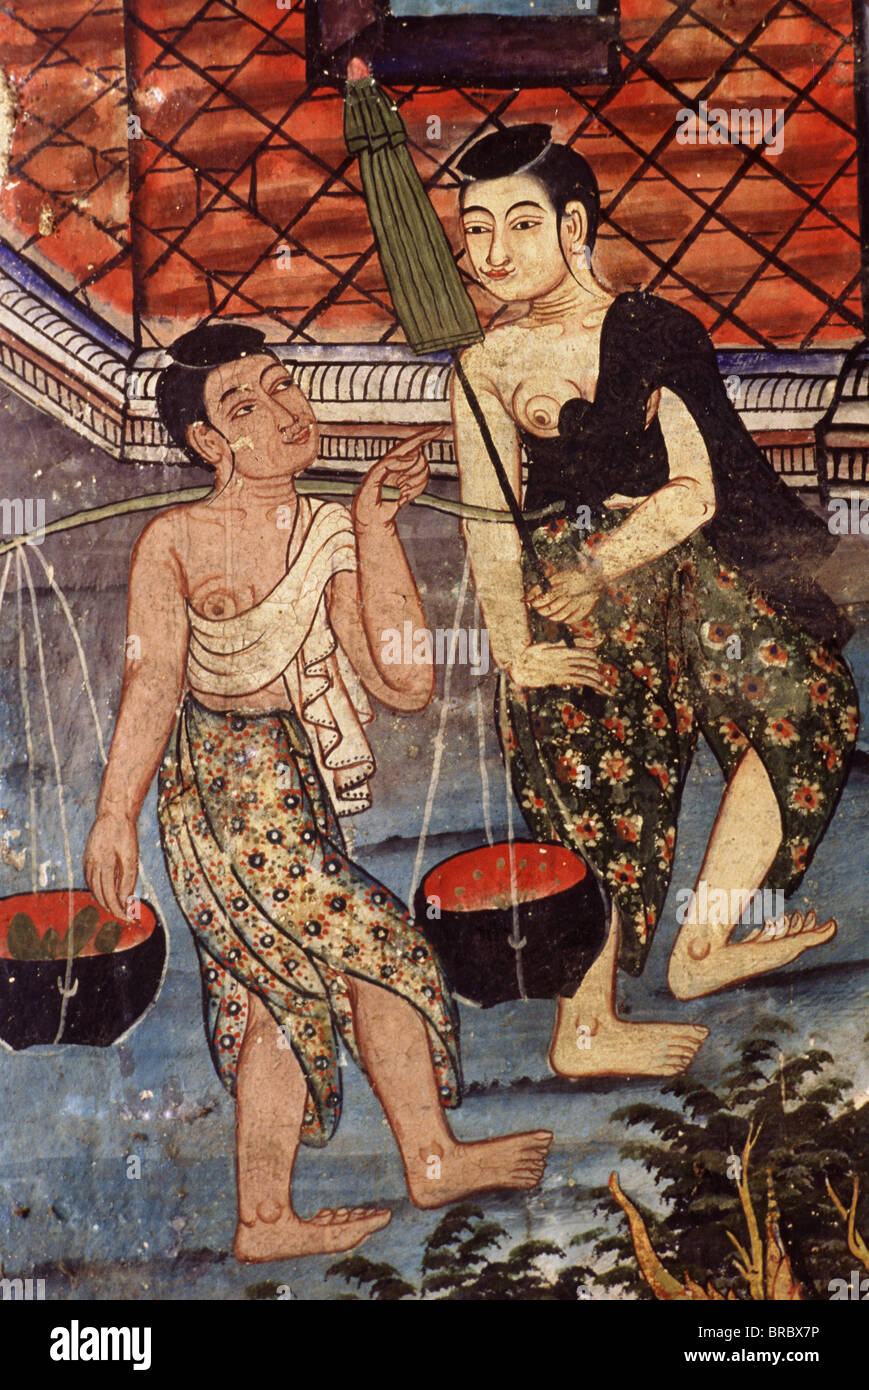 Detail of the murals of the Sang Thong Tales, Viharn Laikam at Wat Phra Singh, Chiang Mai, Thailand - Stock Image